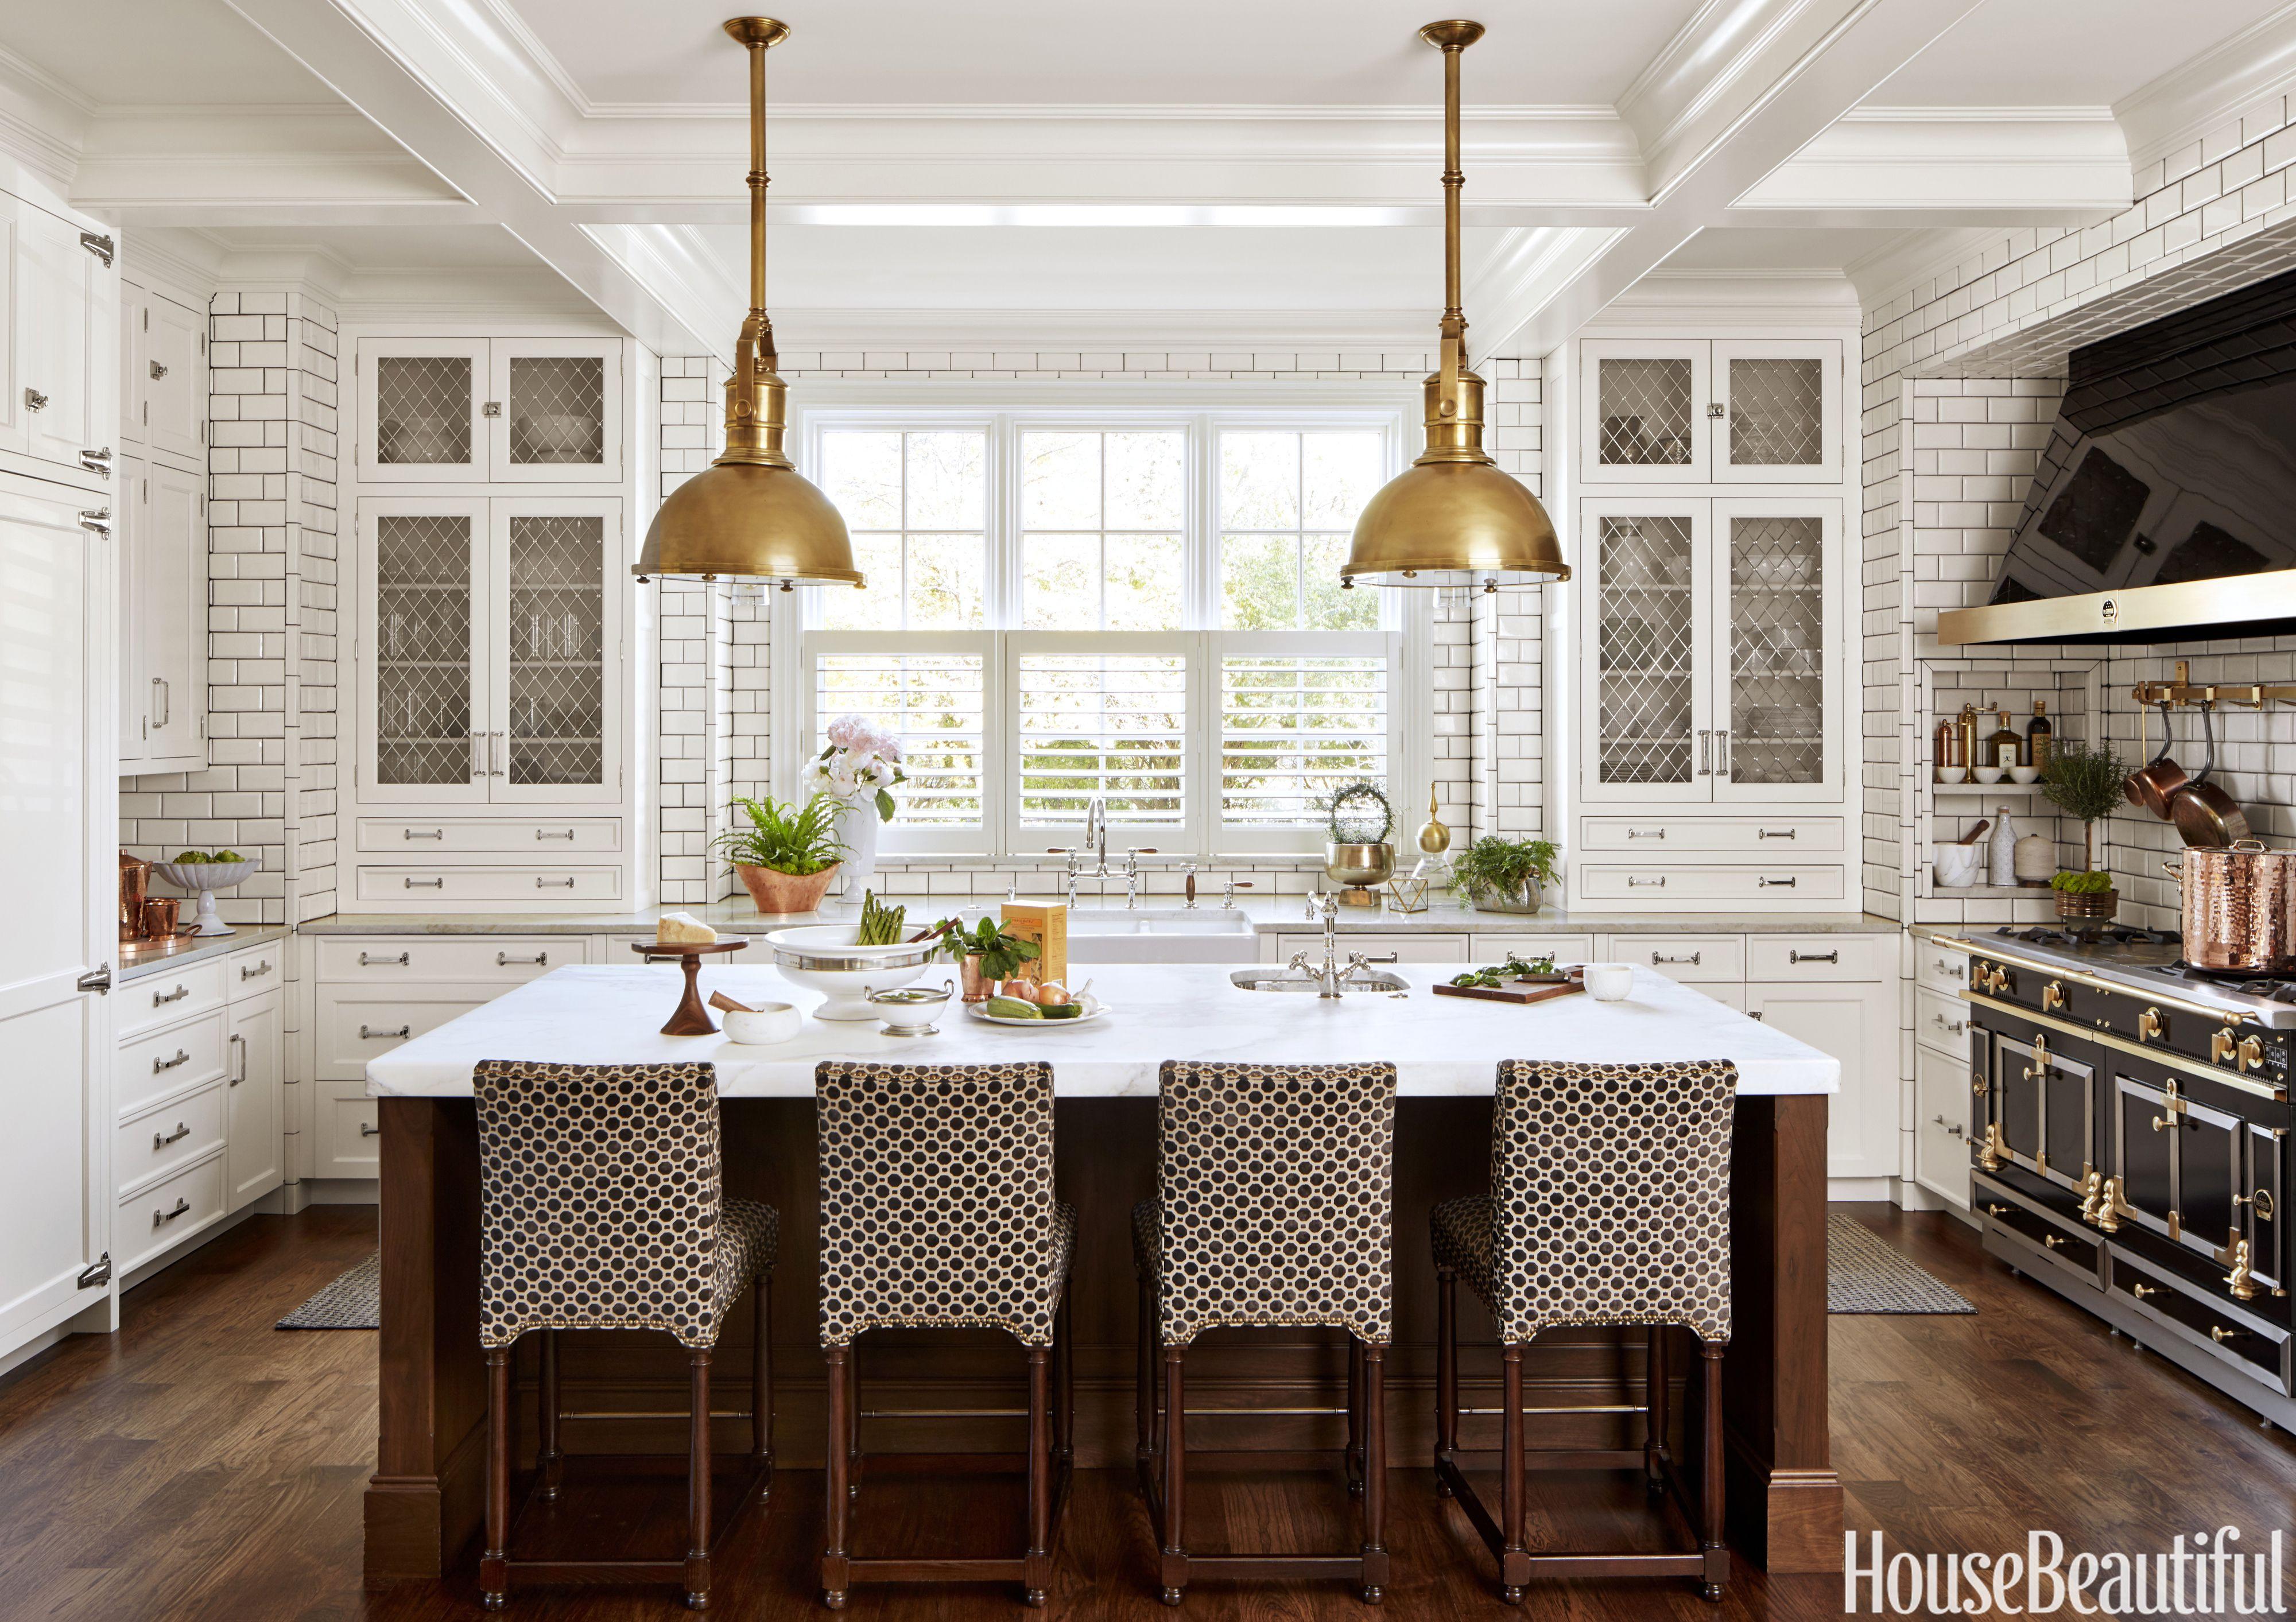 45 Kitchen Cabinet Design Ideas 2019 Unique Kitchen